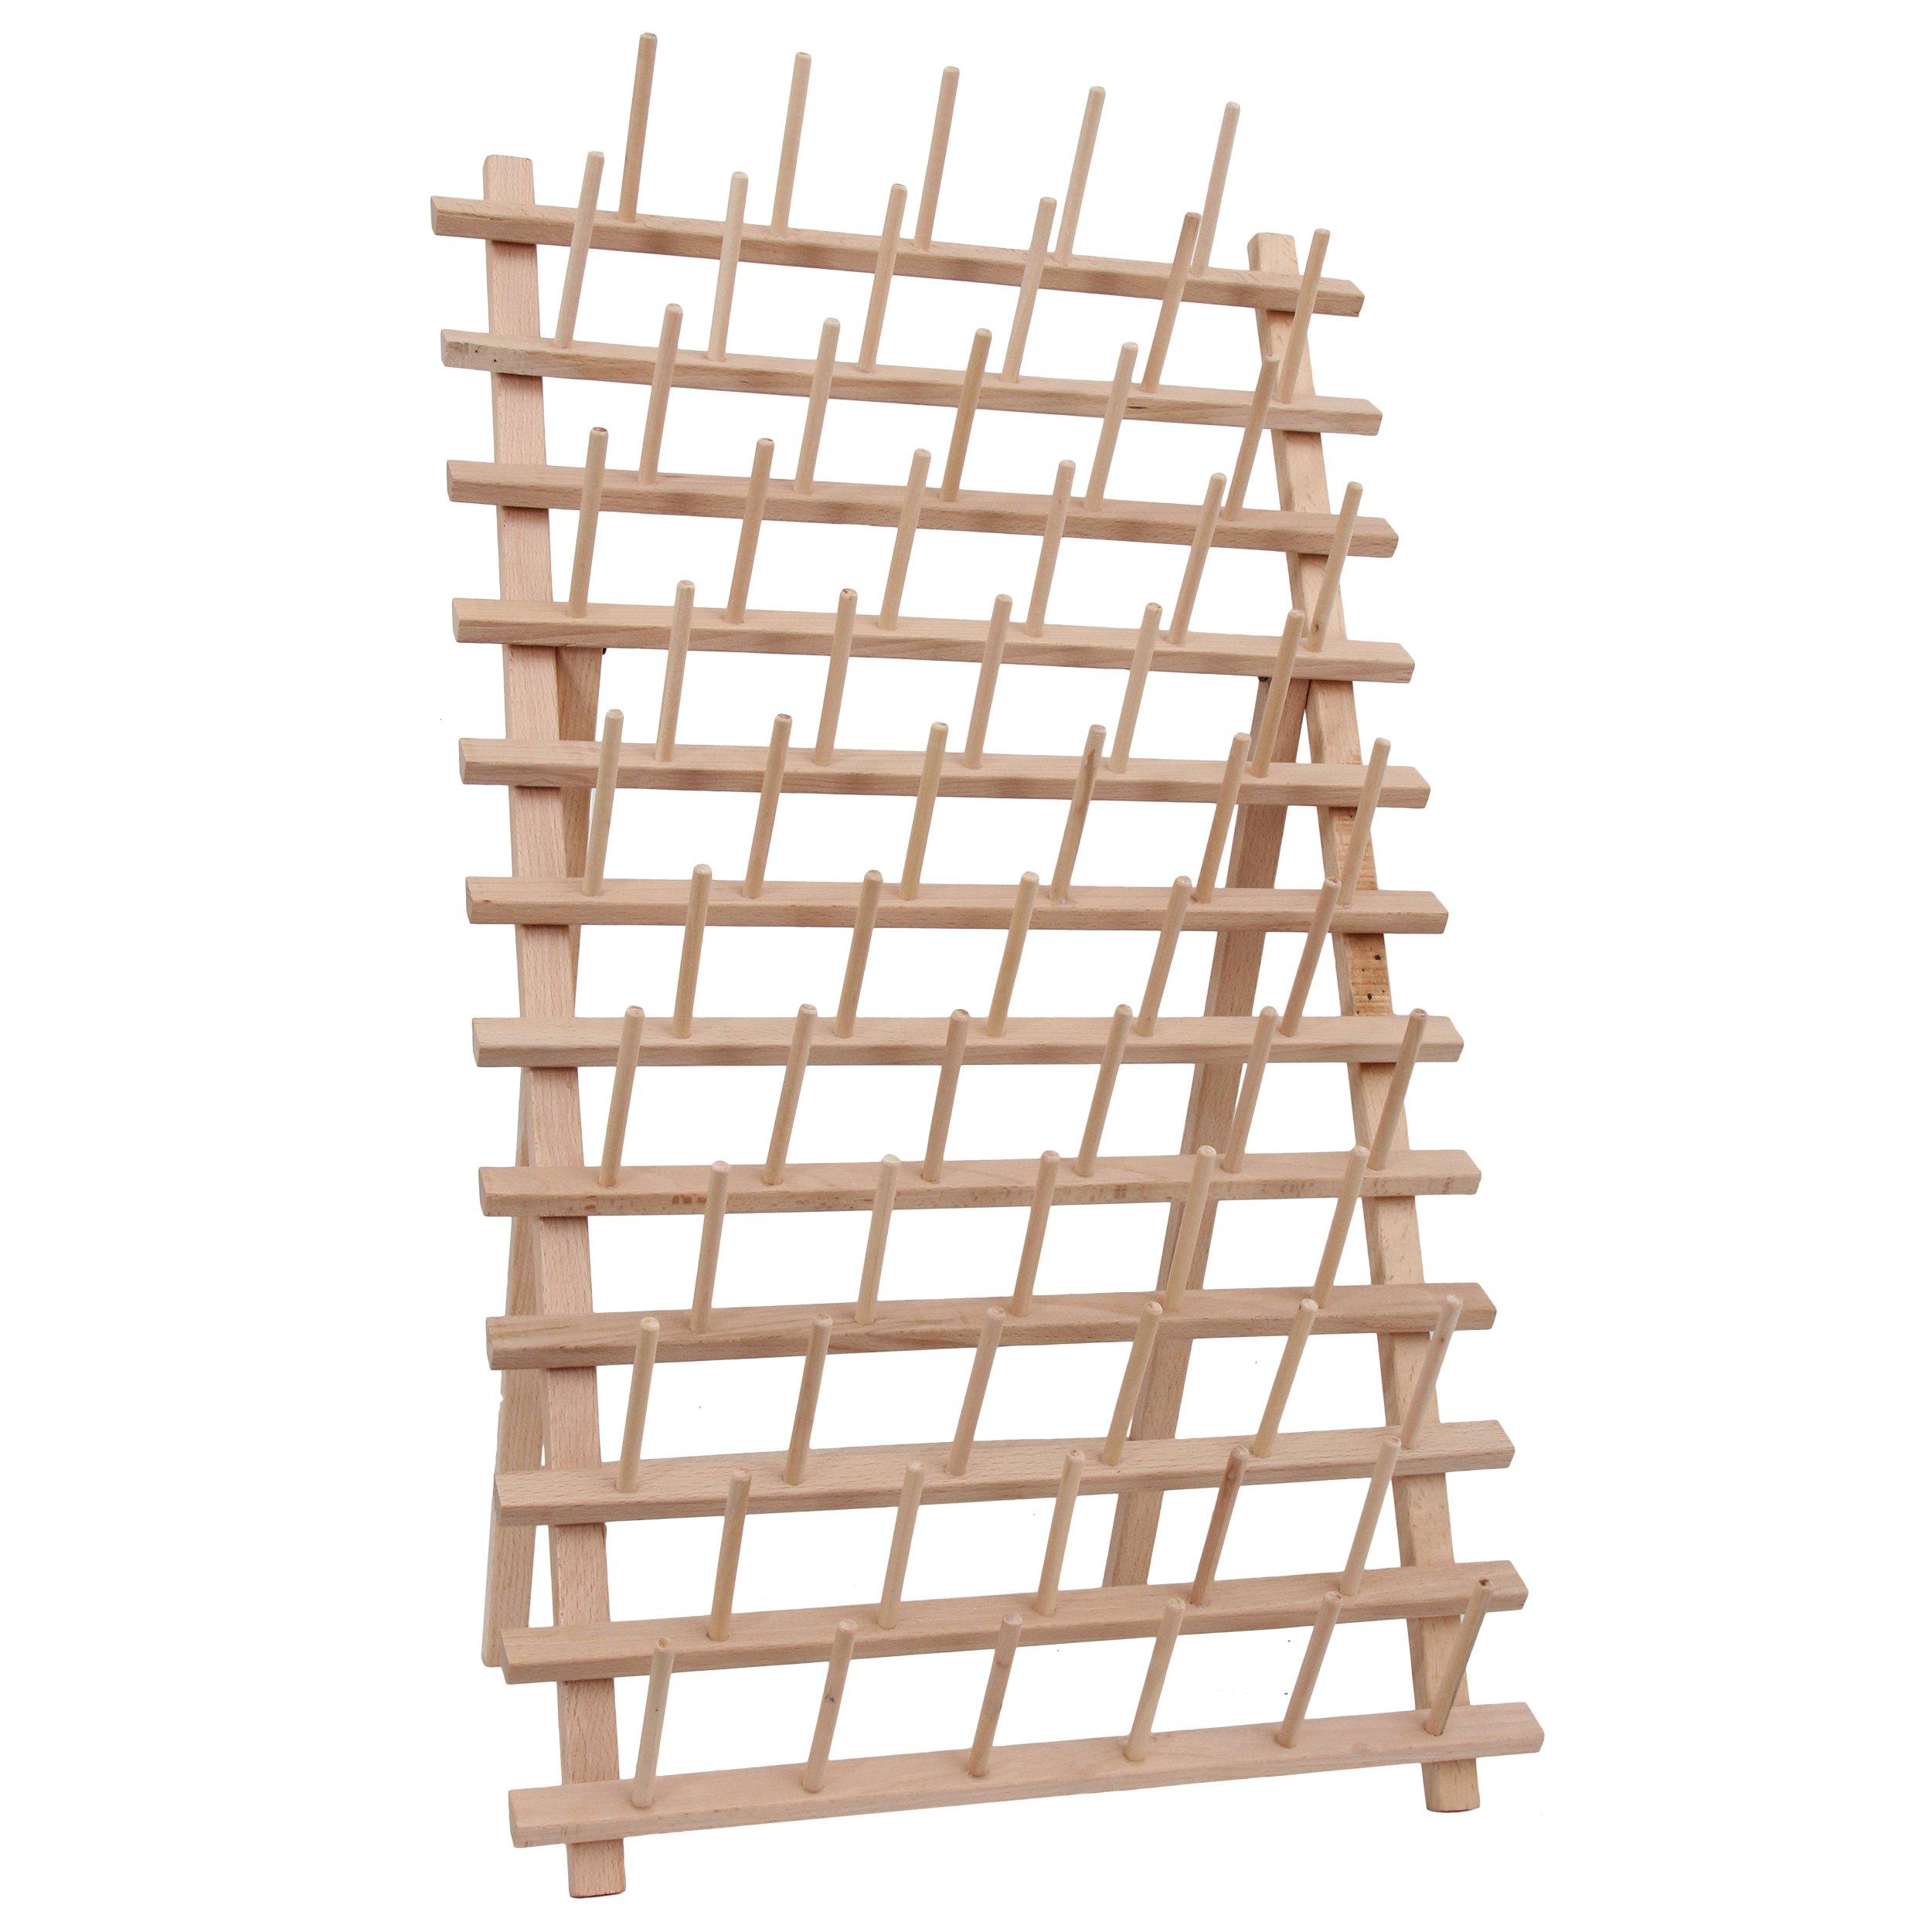 Threadart 66 Large Spool/Cone Wood Thread Rack 3 by Threadart